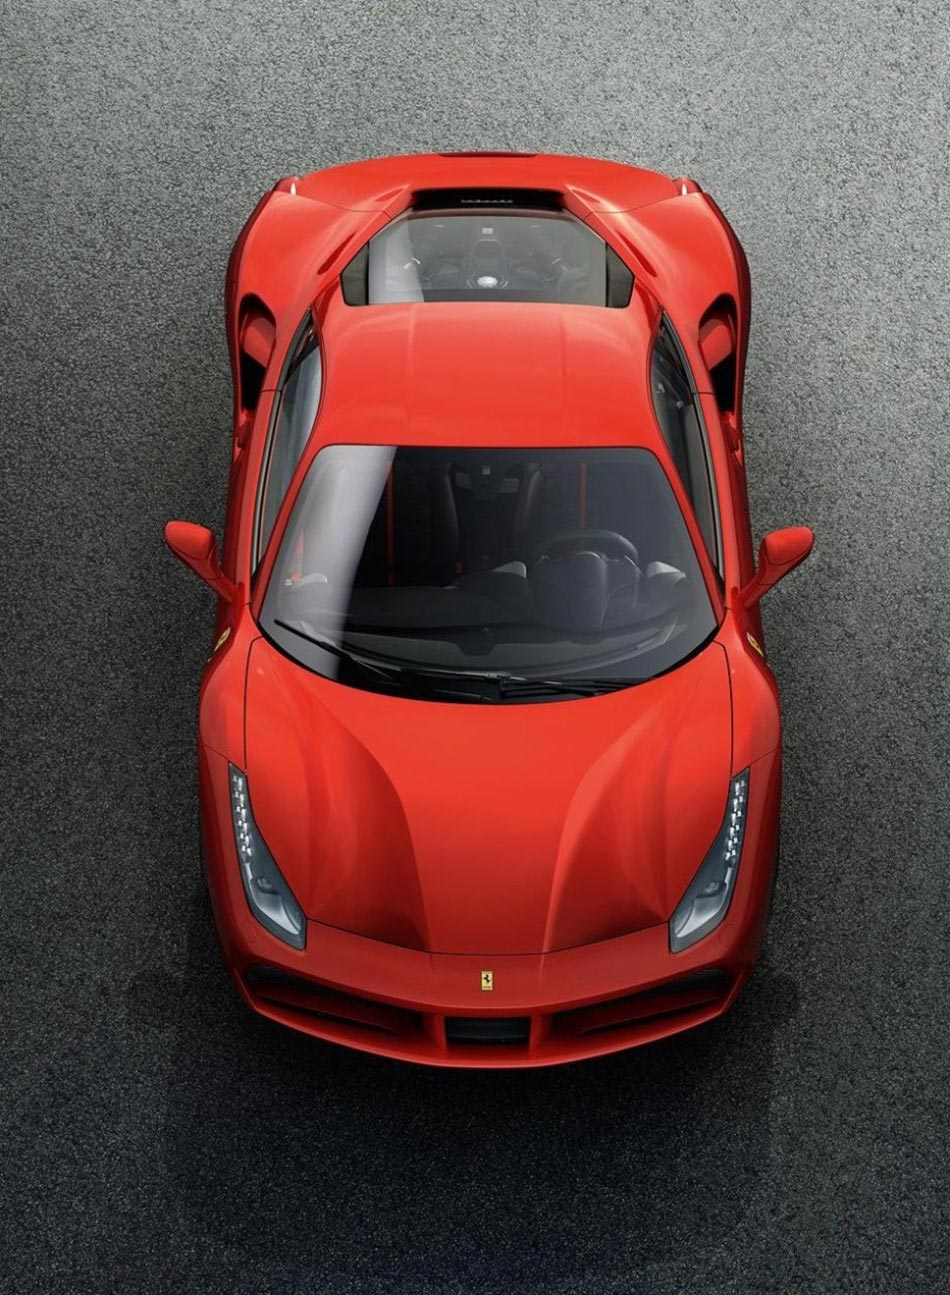 Finally: Ferrari presents the 488 GTB Turbo V8 with 670PS 4